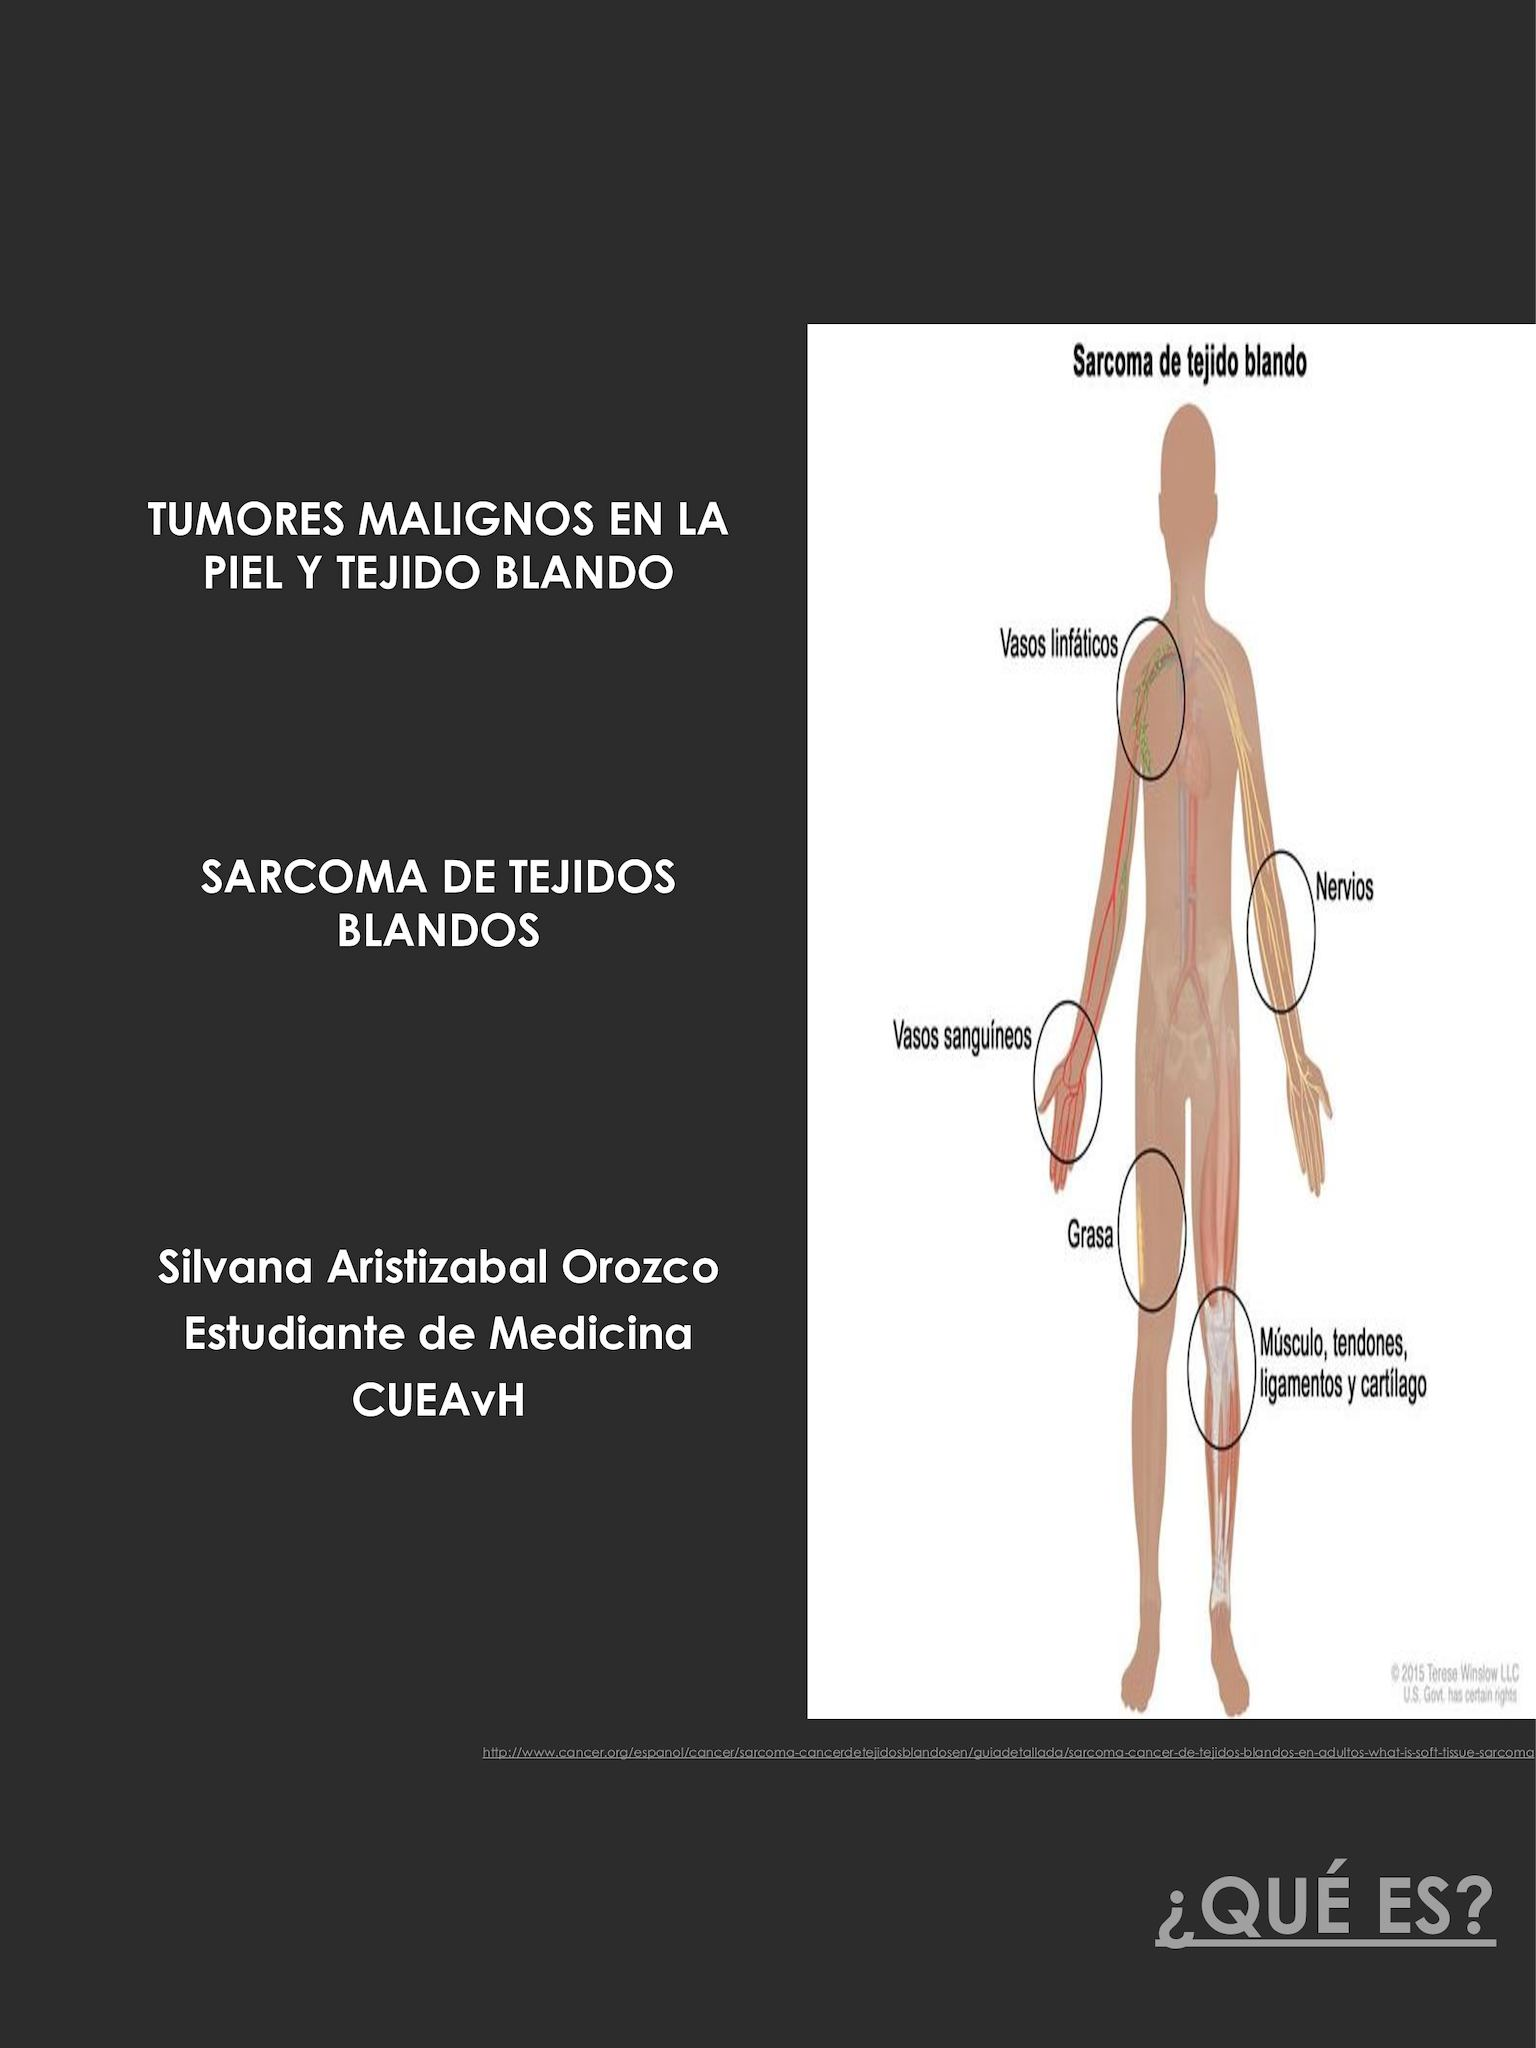 Sarcoma cancer in hand. Sarcoma cancer by age.